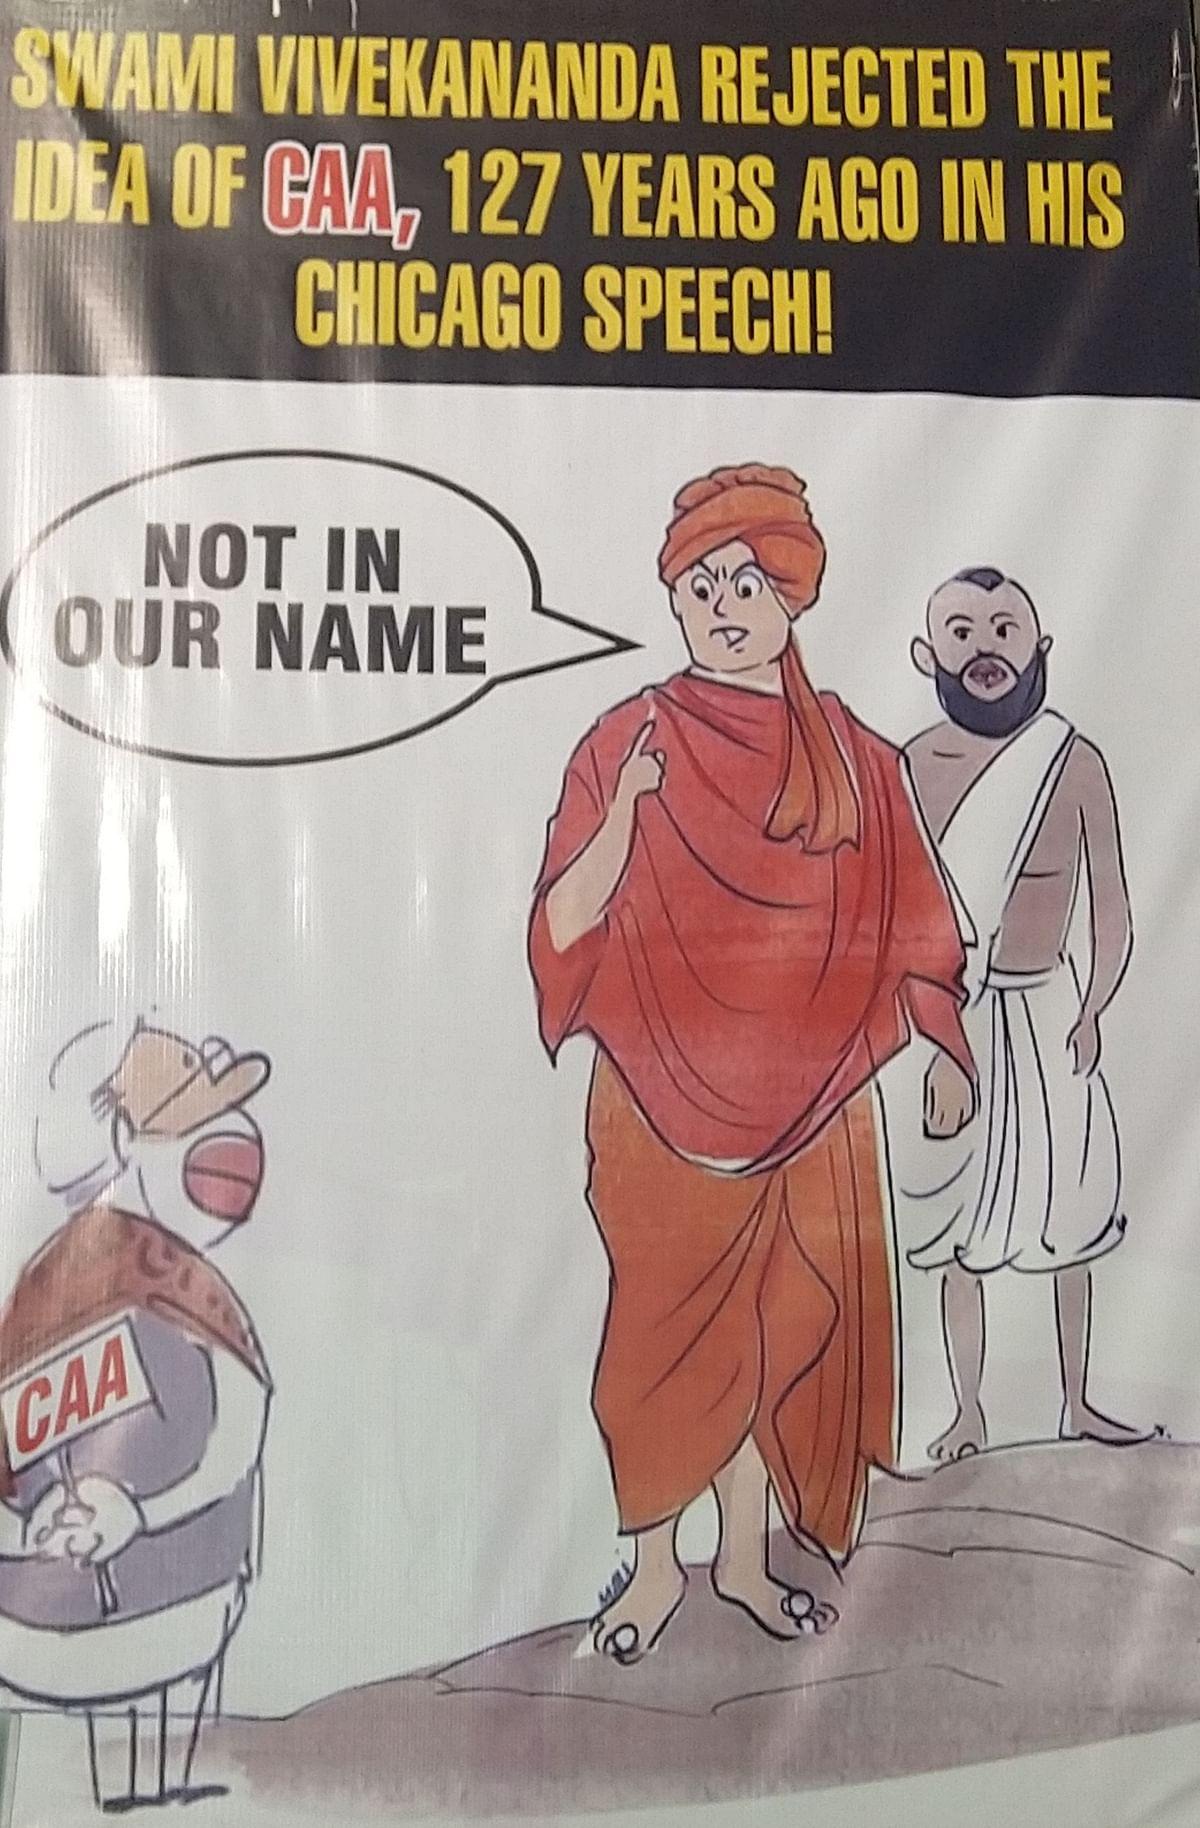 A poster at the anti-CAA protest in Park Circus Kolkata shows Swami Vivekananda and Ramakrishna Paramhans opposing Modi on CAA.